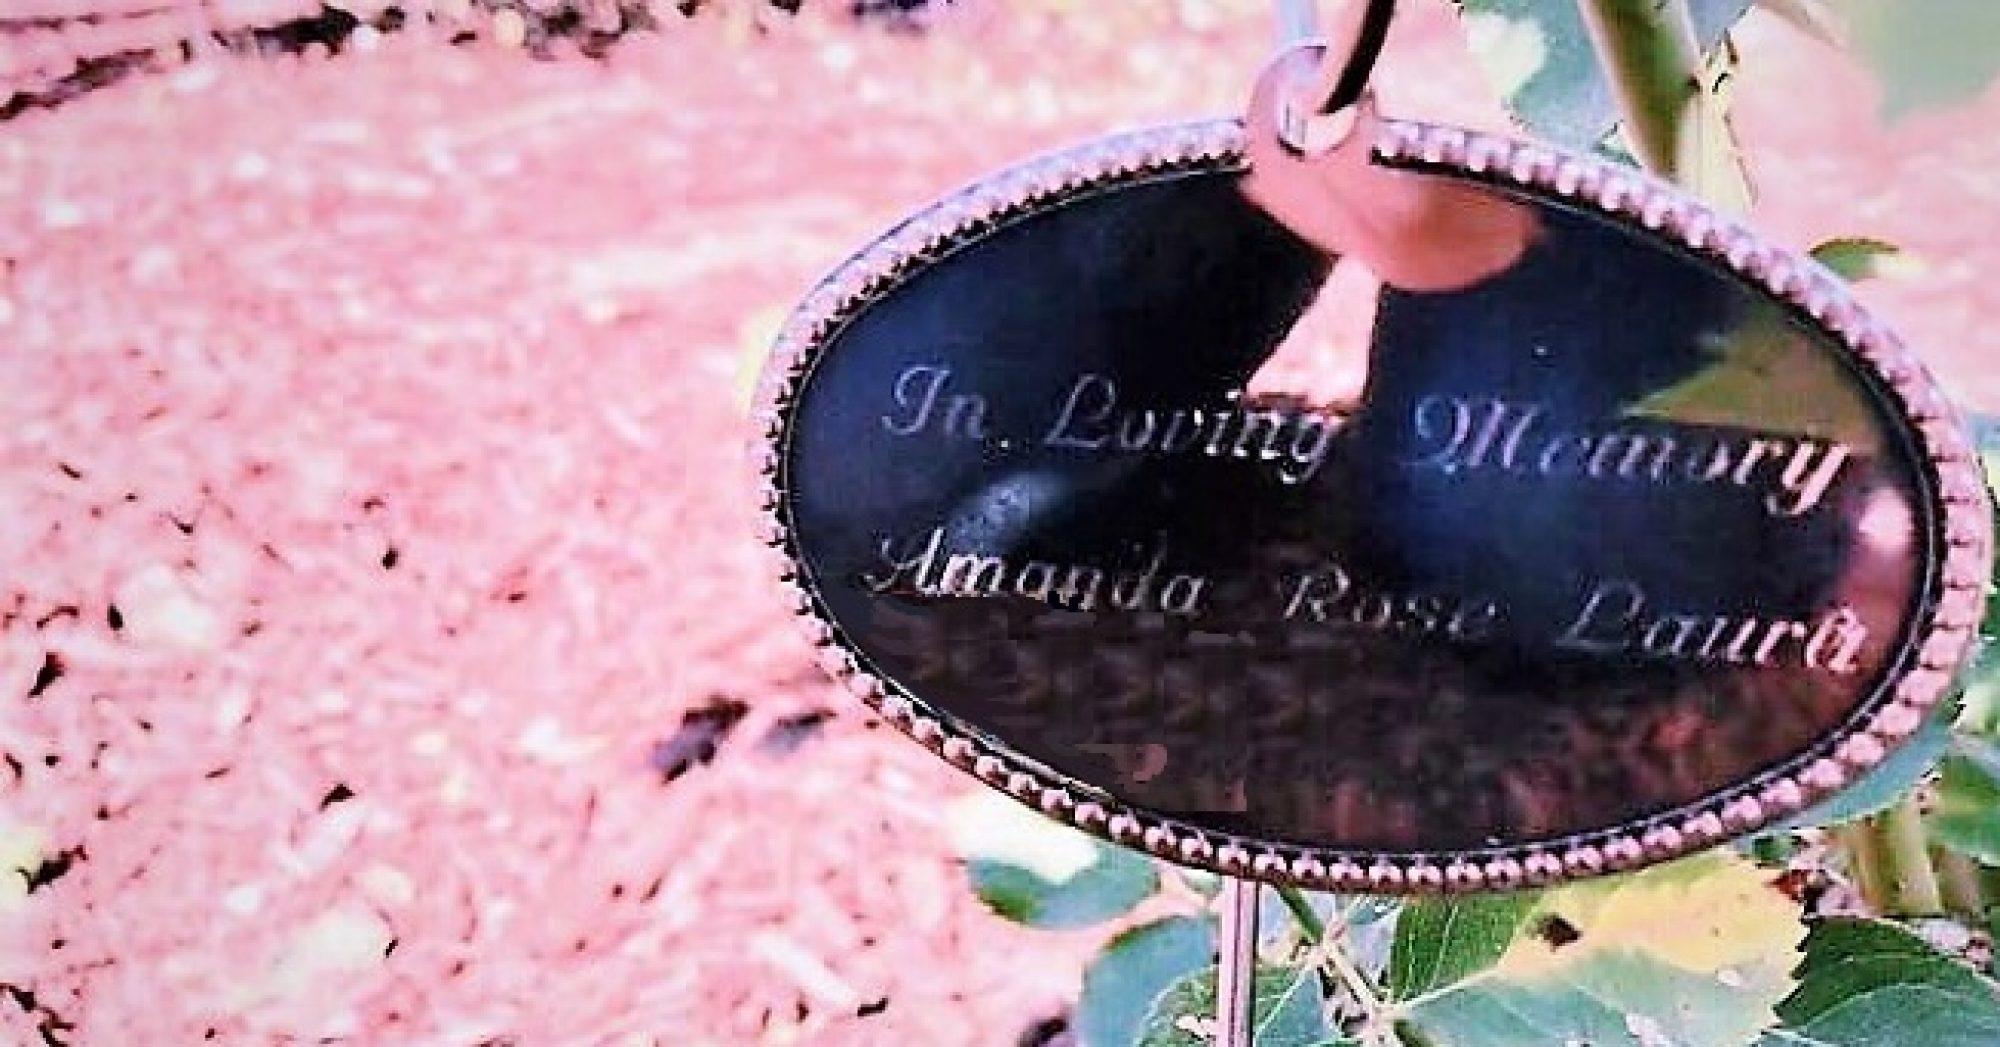 The Amanda Rose Laura Foundation